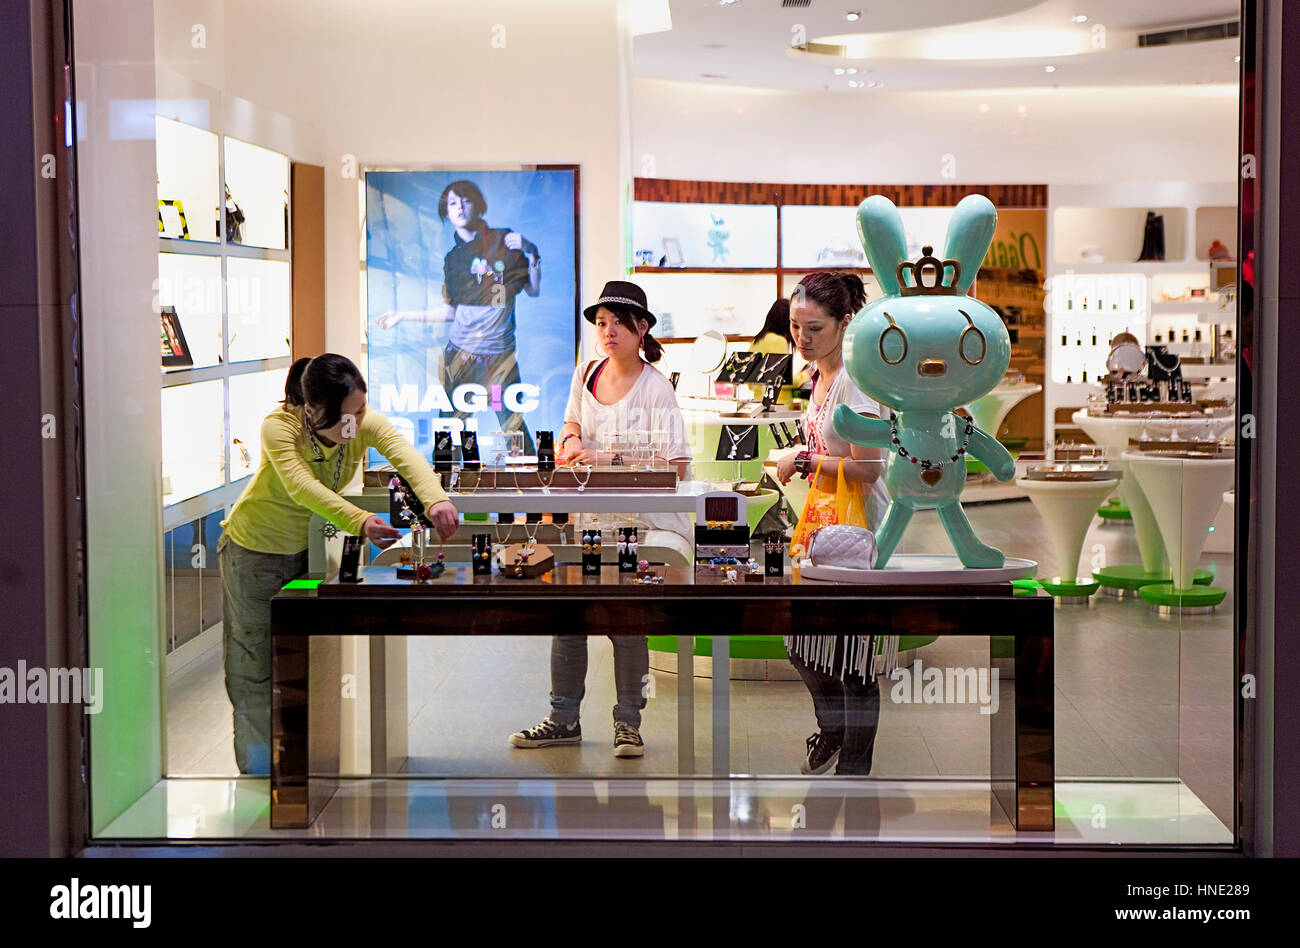 Shop in  Venetian hotel & casino, Taipa island,Macau,China - Stock Image